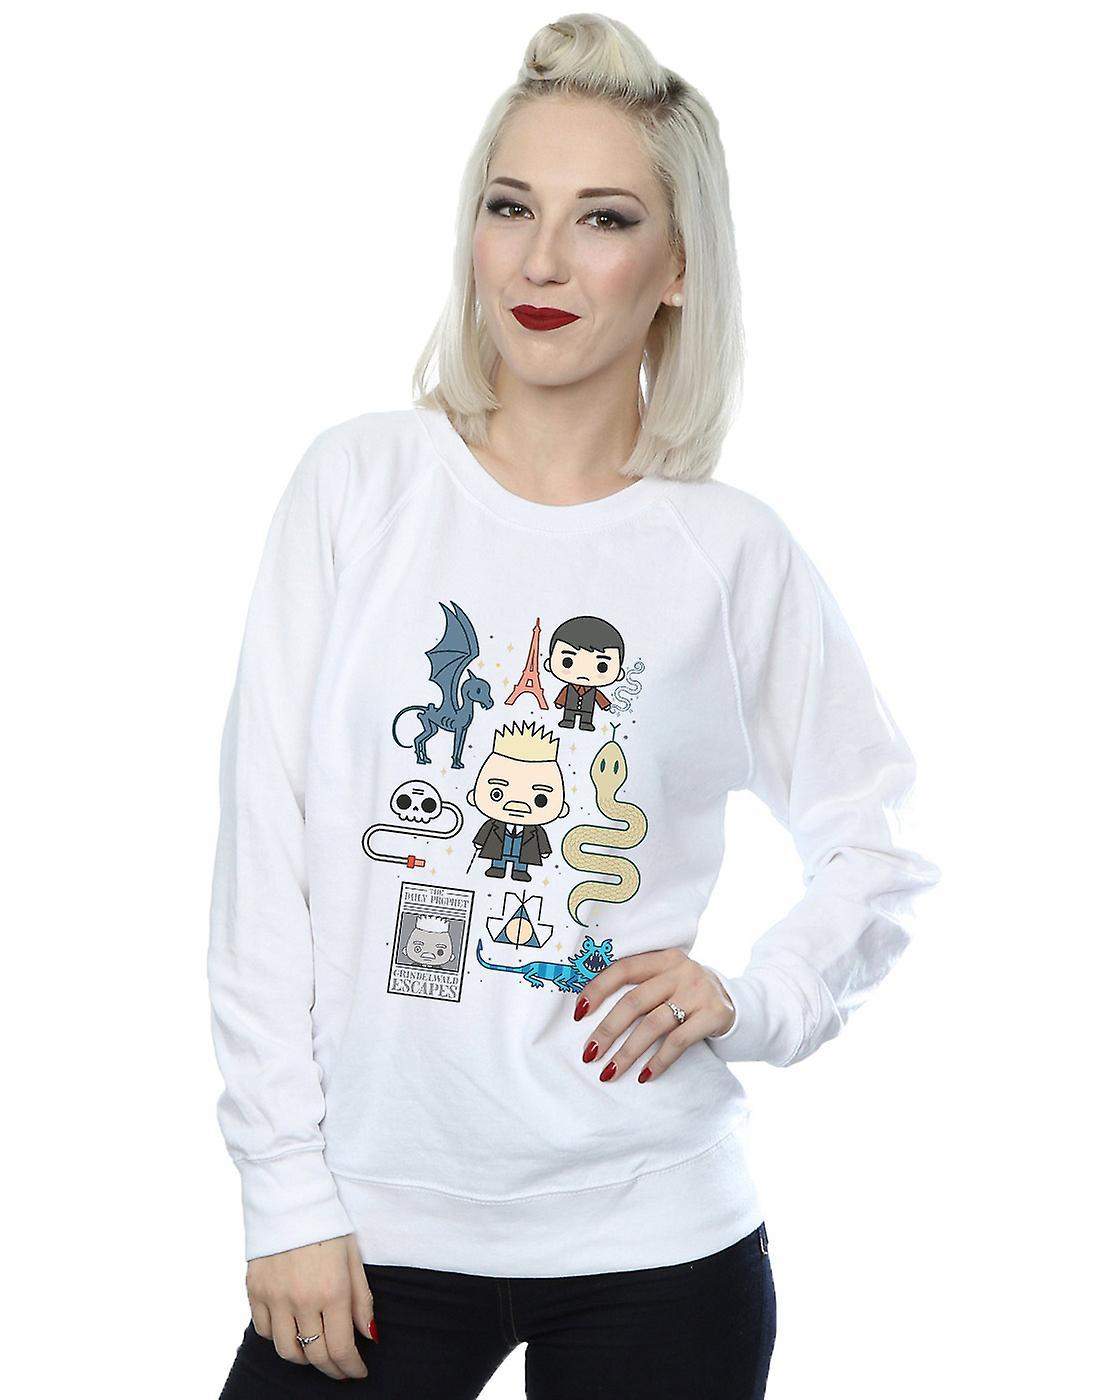 Fantastic Beasts Women's Chibi Grindelwald Sweatshirt